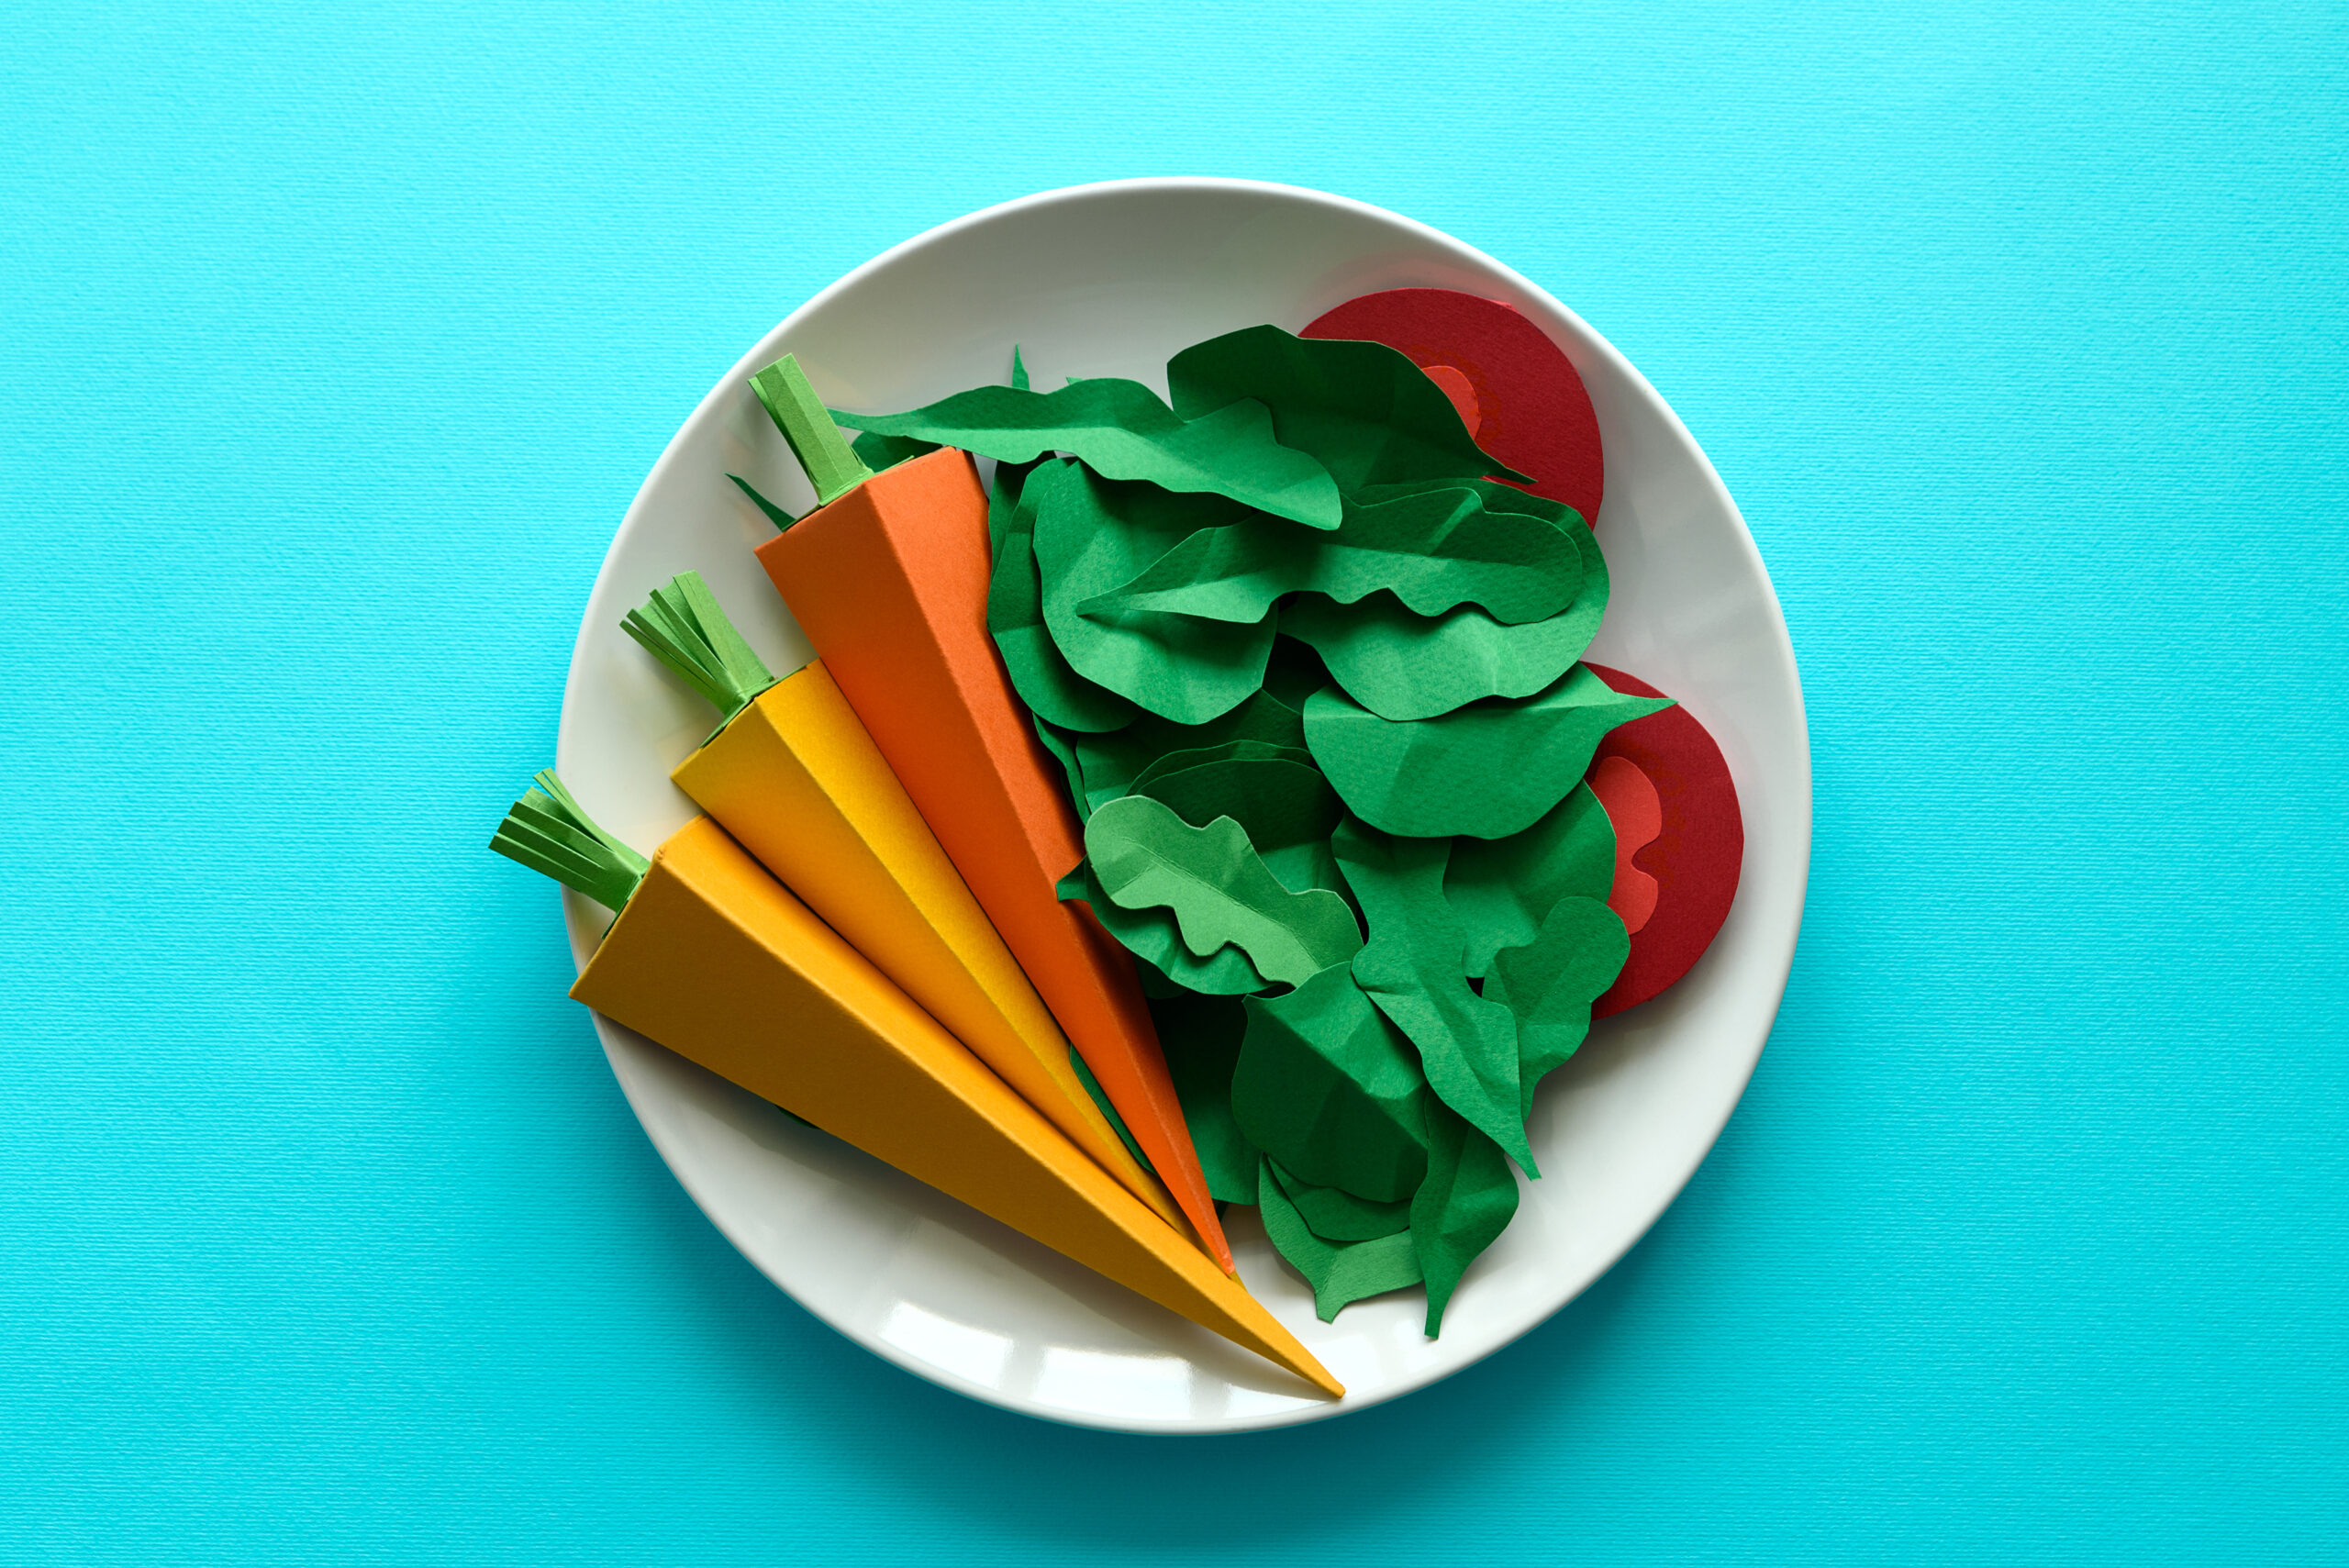 fake food, fake healthy food, health vs unhealthy food